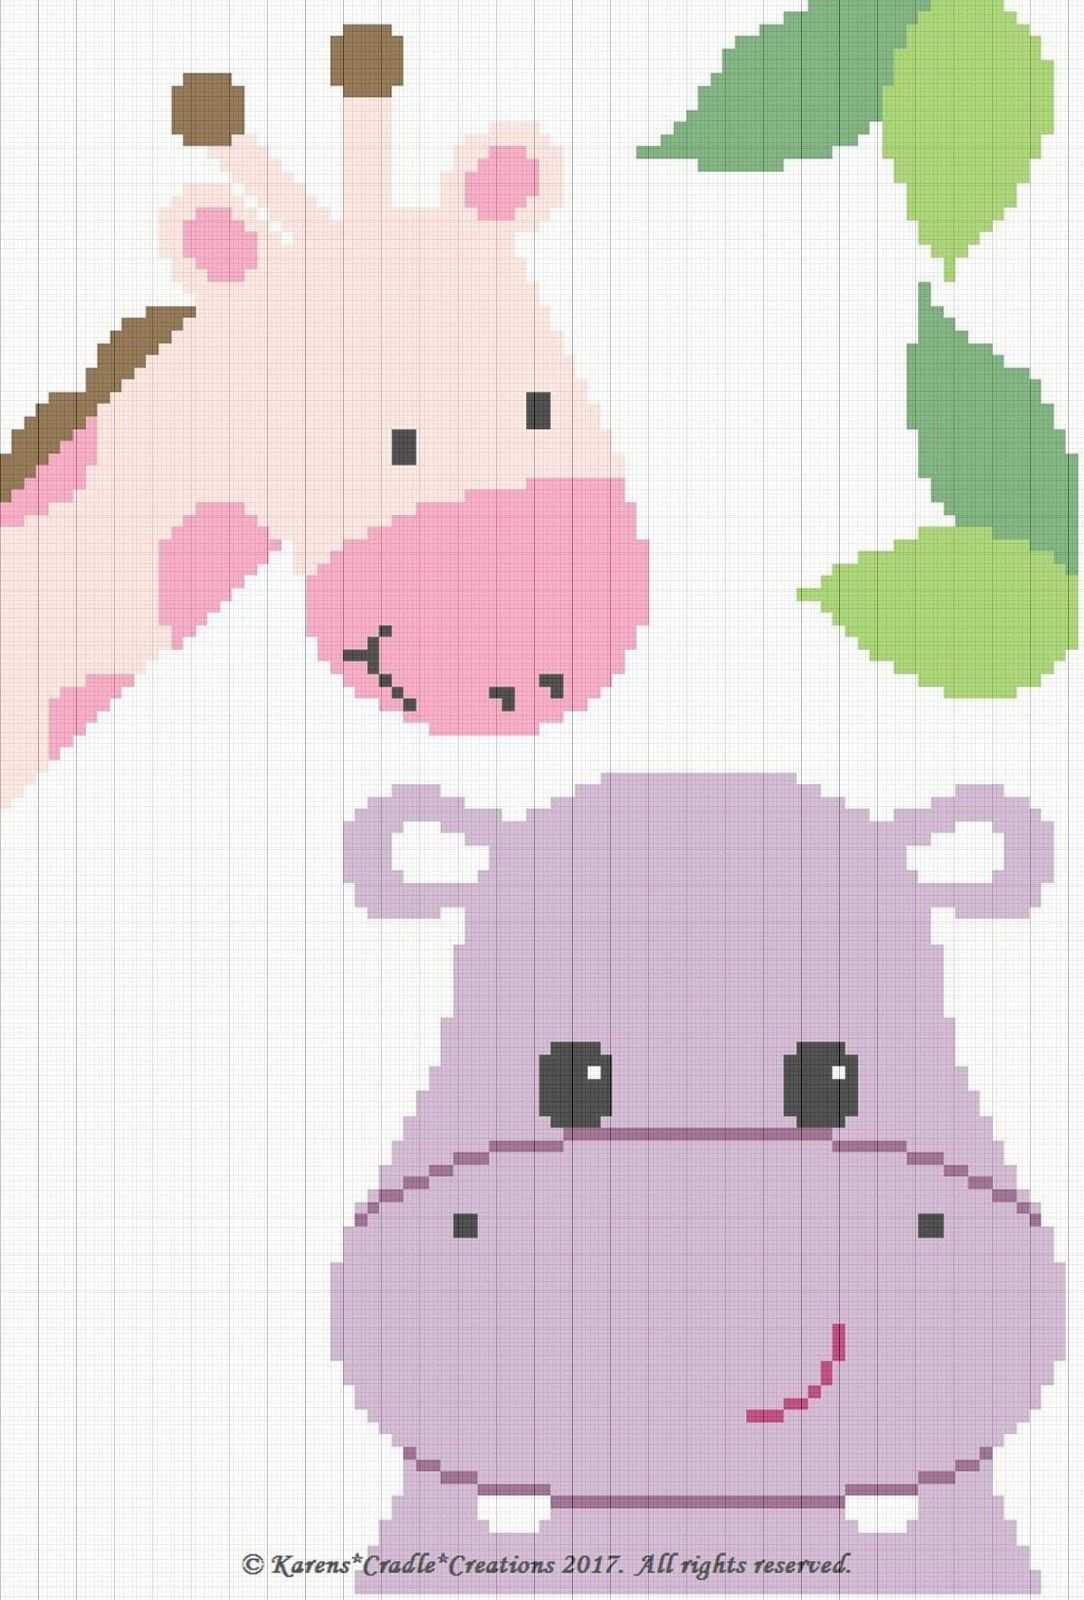 Crochet Patterns Hippo And Giraffe Color Graph Baby Girl Afghan Graph Pattern For Sale 6 00 See Photos C2c Hakeldecke Decke Stricken Hakeln C2c Hakeln